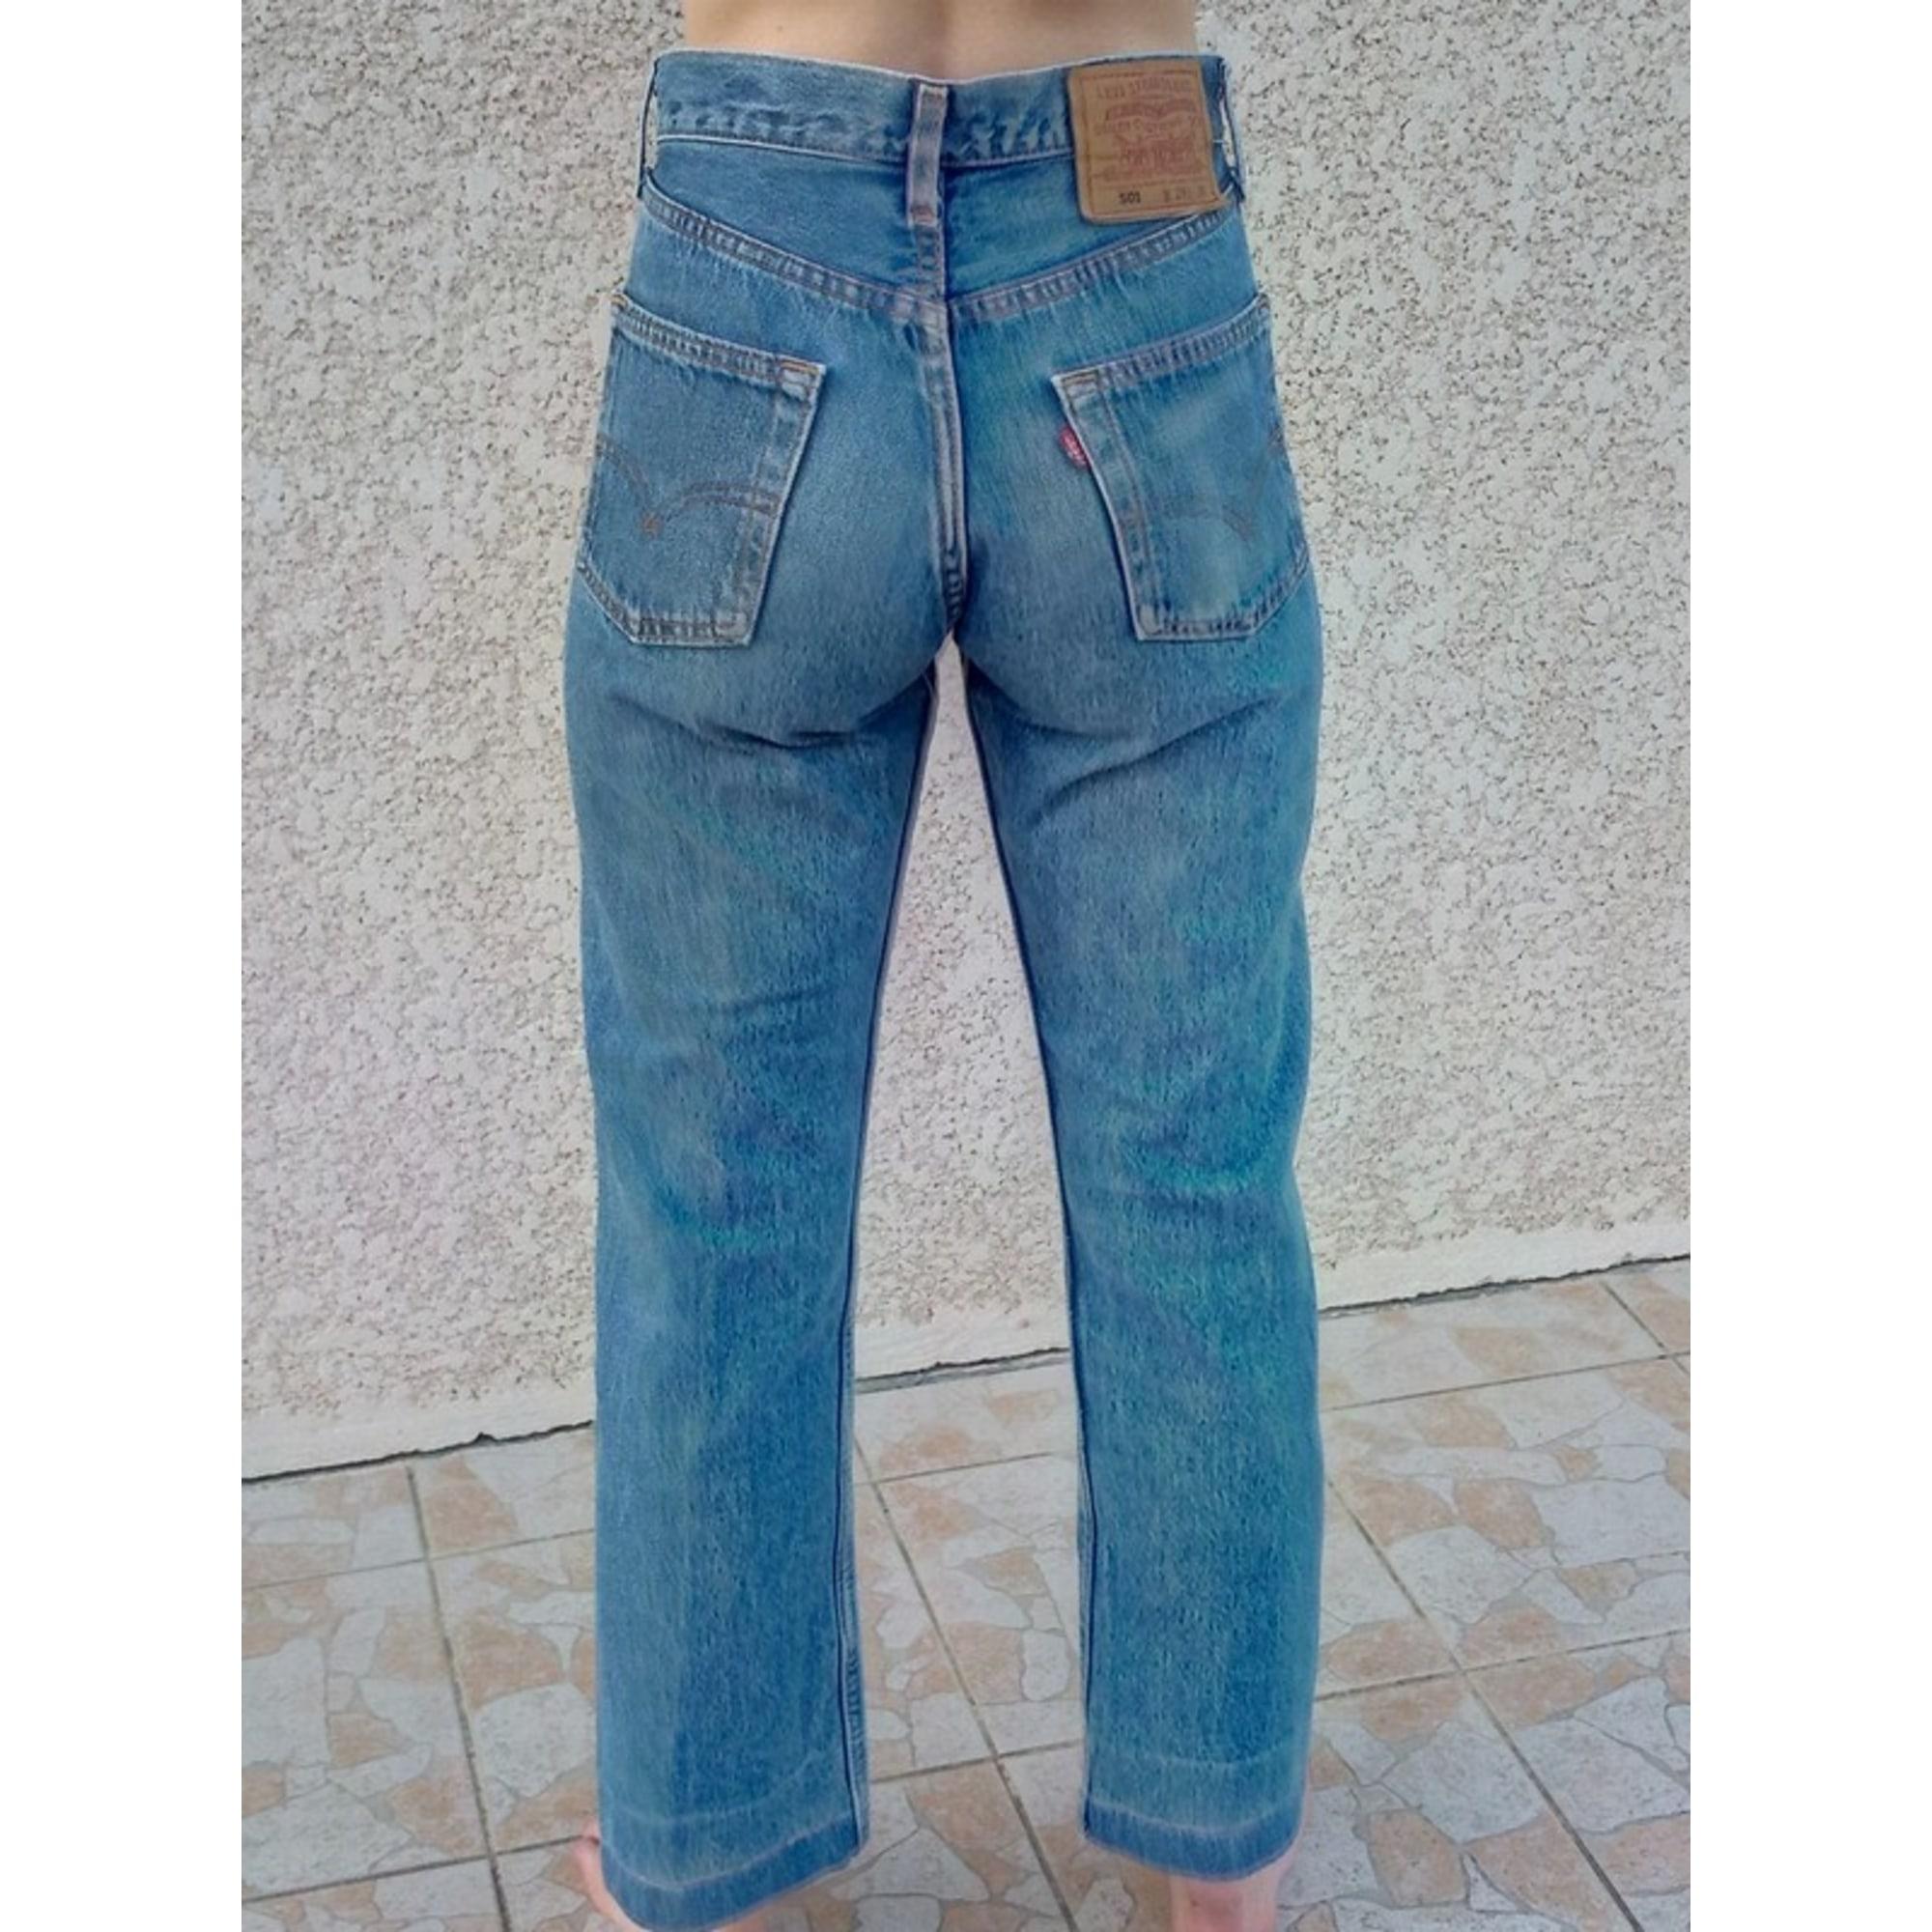 Jeans large, boyfriend LEVI'S Bleu, bleu marine, bleu turquoise